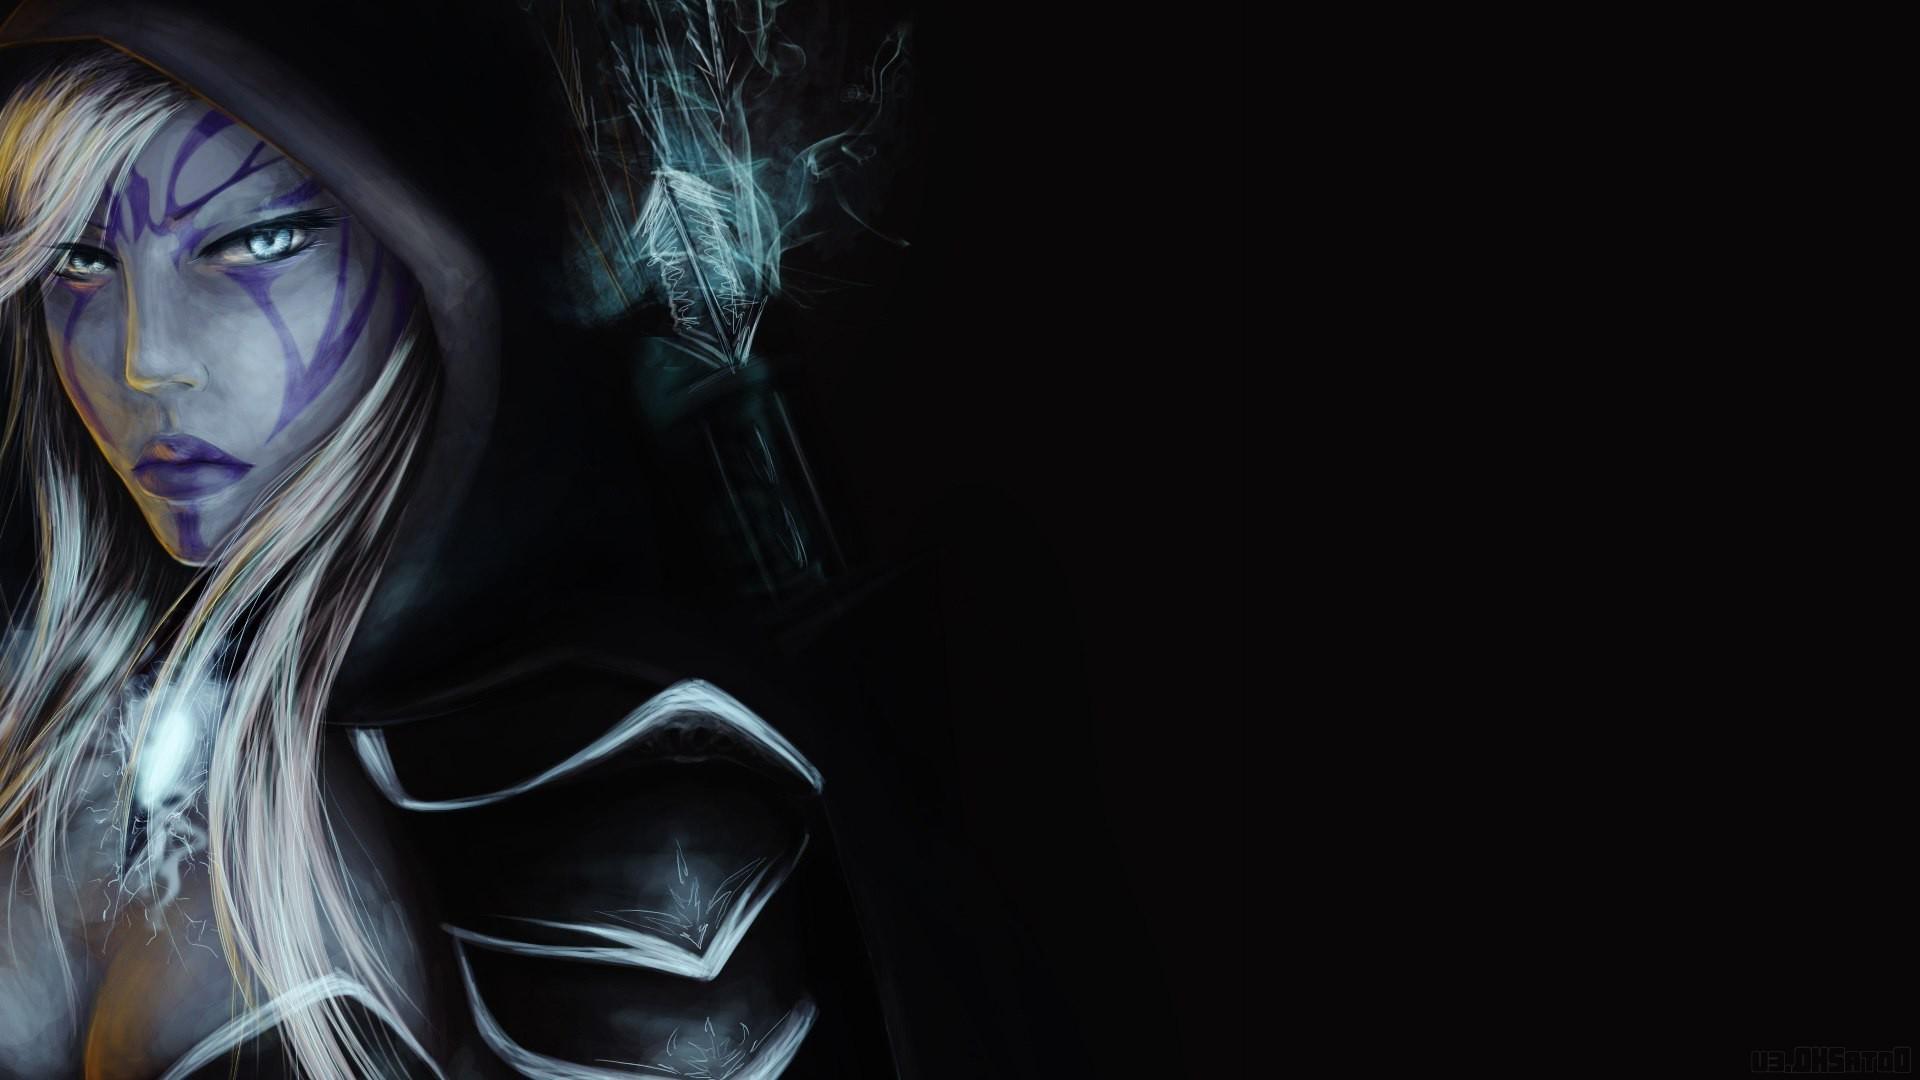 Dota, Dota 2, Defense Of The Ancient, Valve, Valve - Dota 2 Hero Drow , HD Wallpaper & Backgrounds